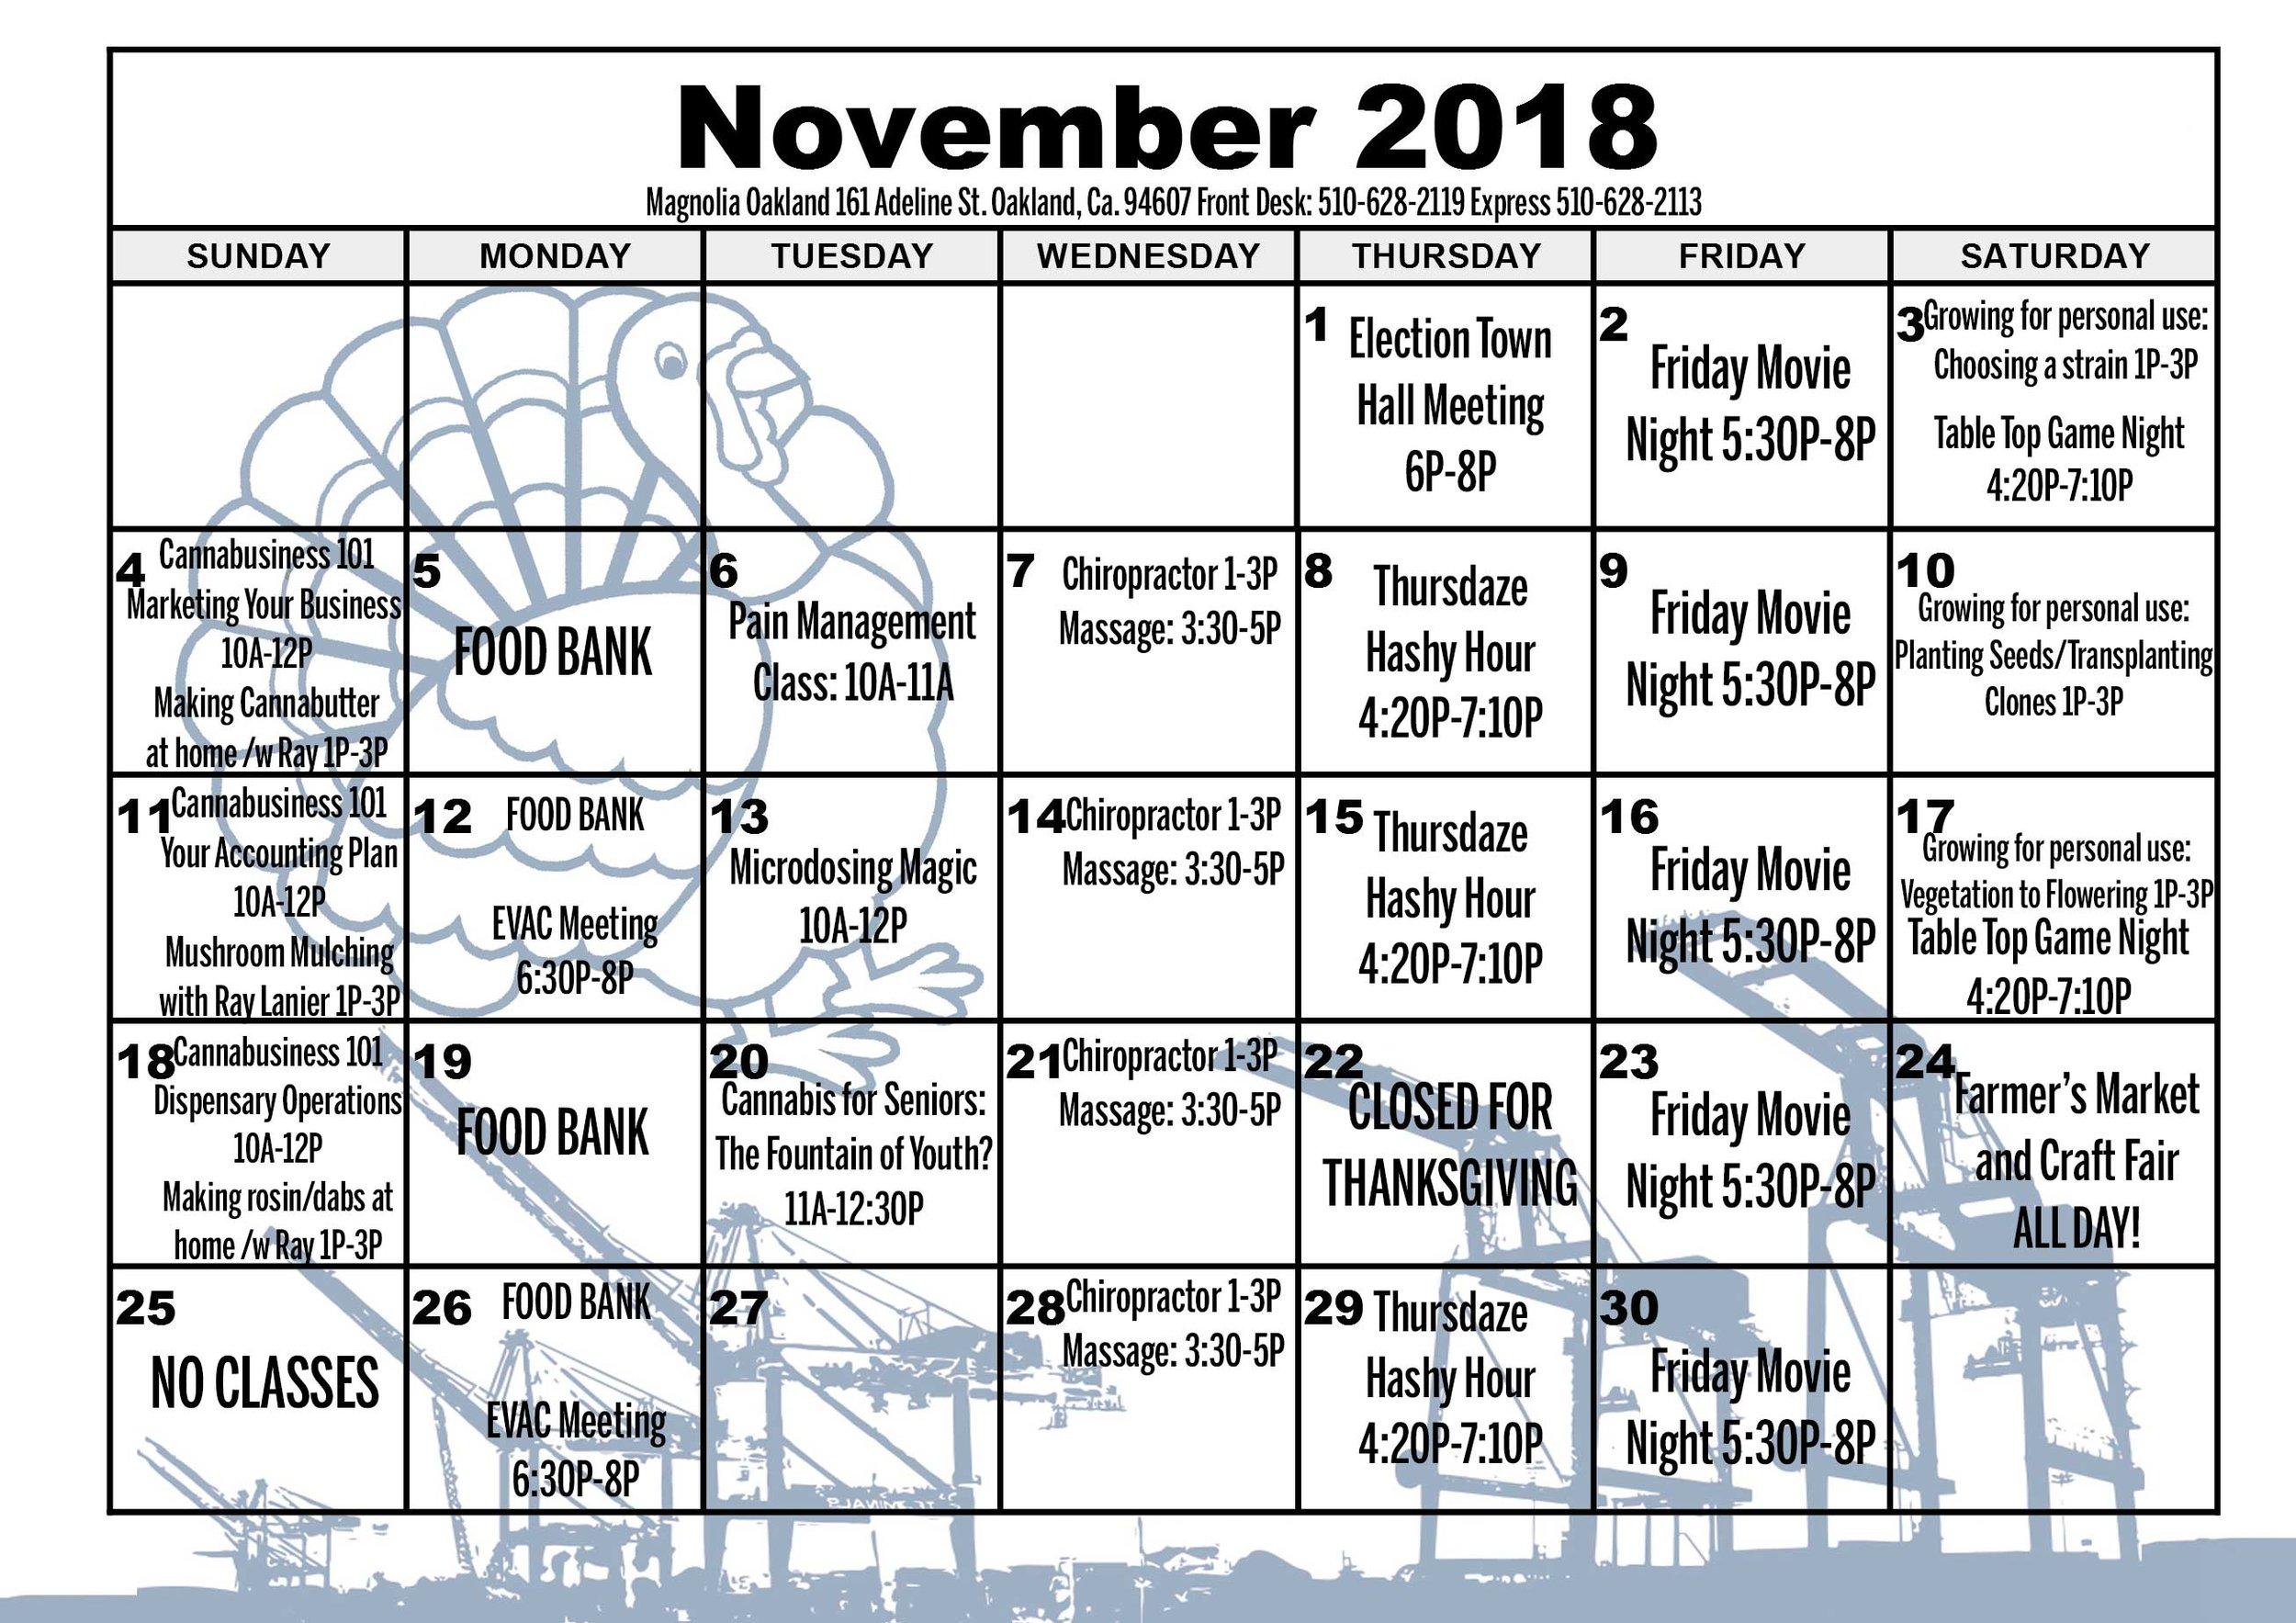 november-2018-printable-calendar-monthly-calendar-template-pertaining-to-november-2018-calendar.jpg